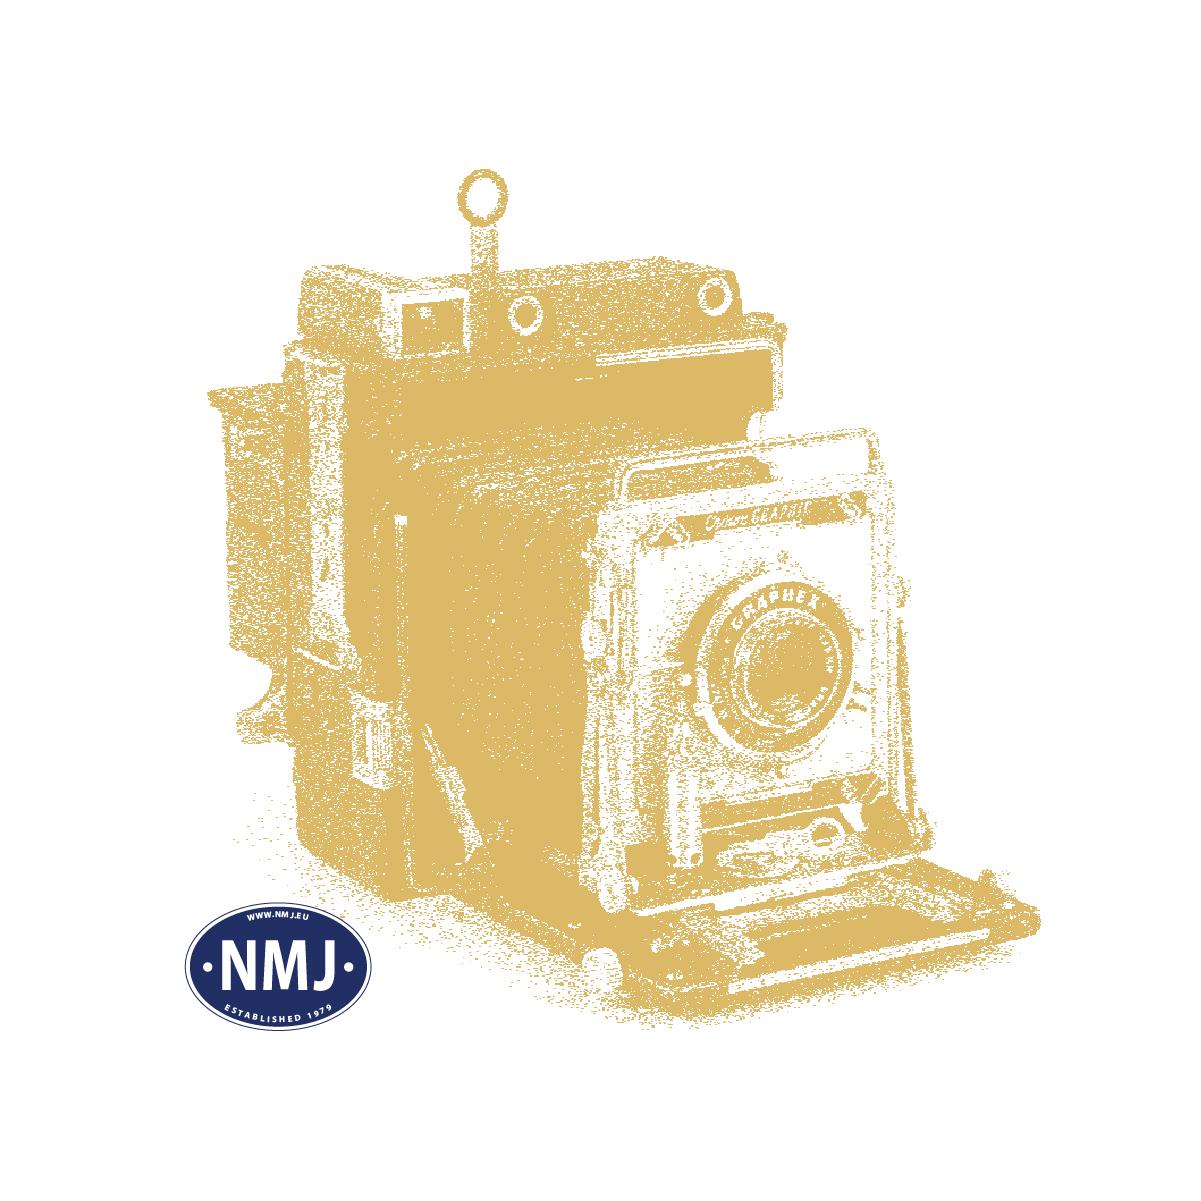 NMJT82.303 - NMJ Topline NSB El13.2139, Red/Silver, DC